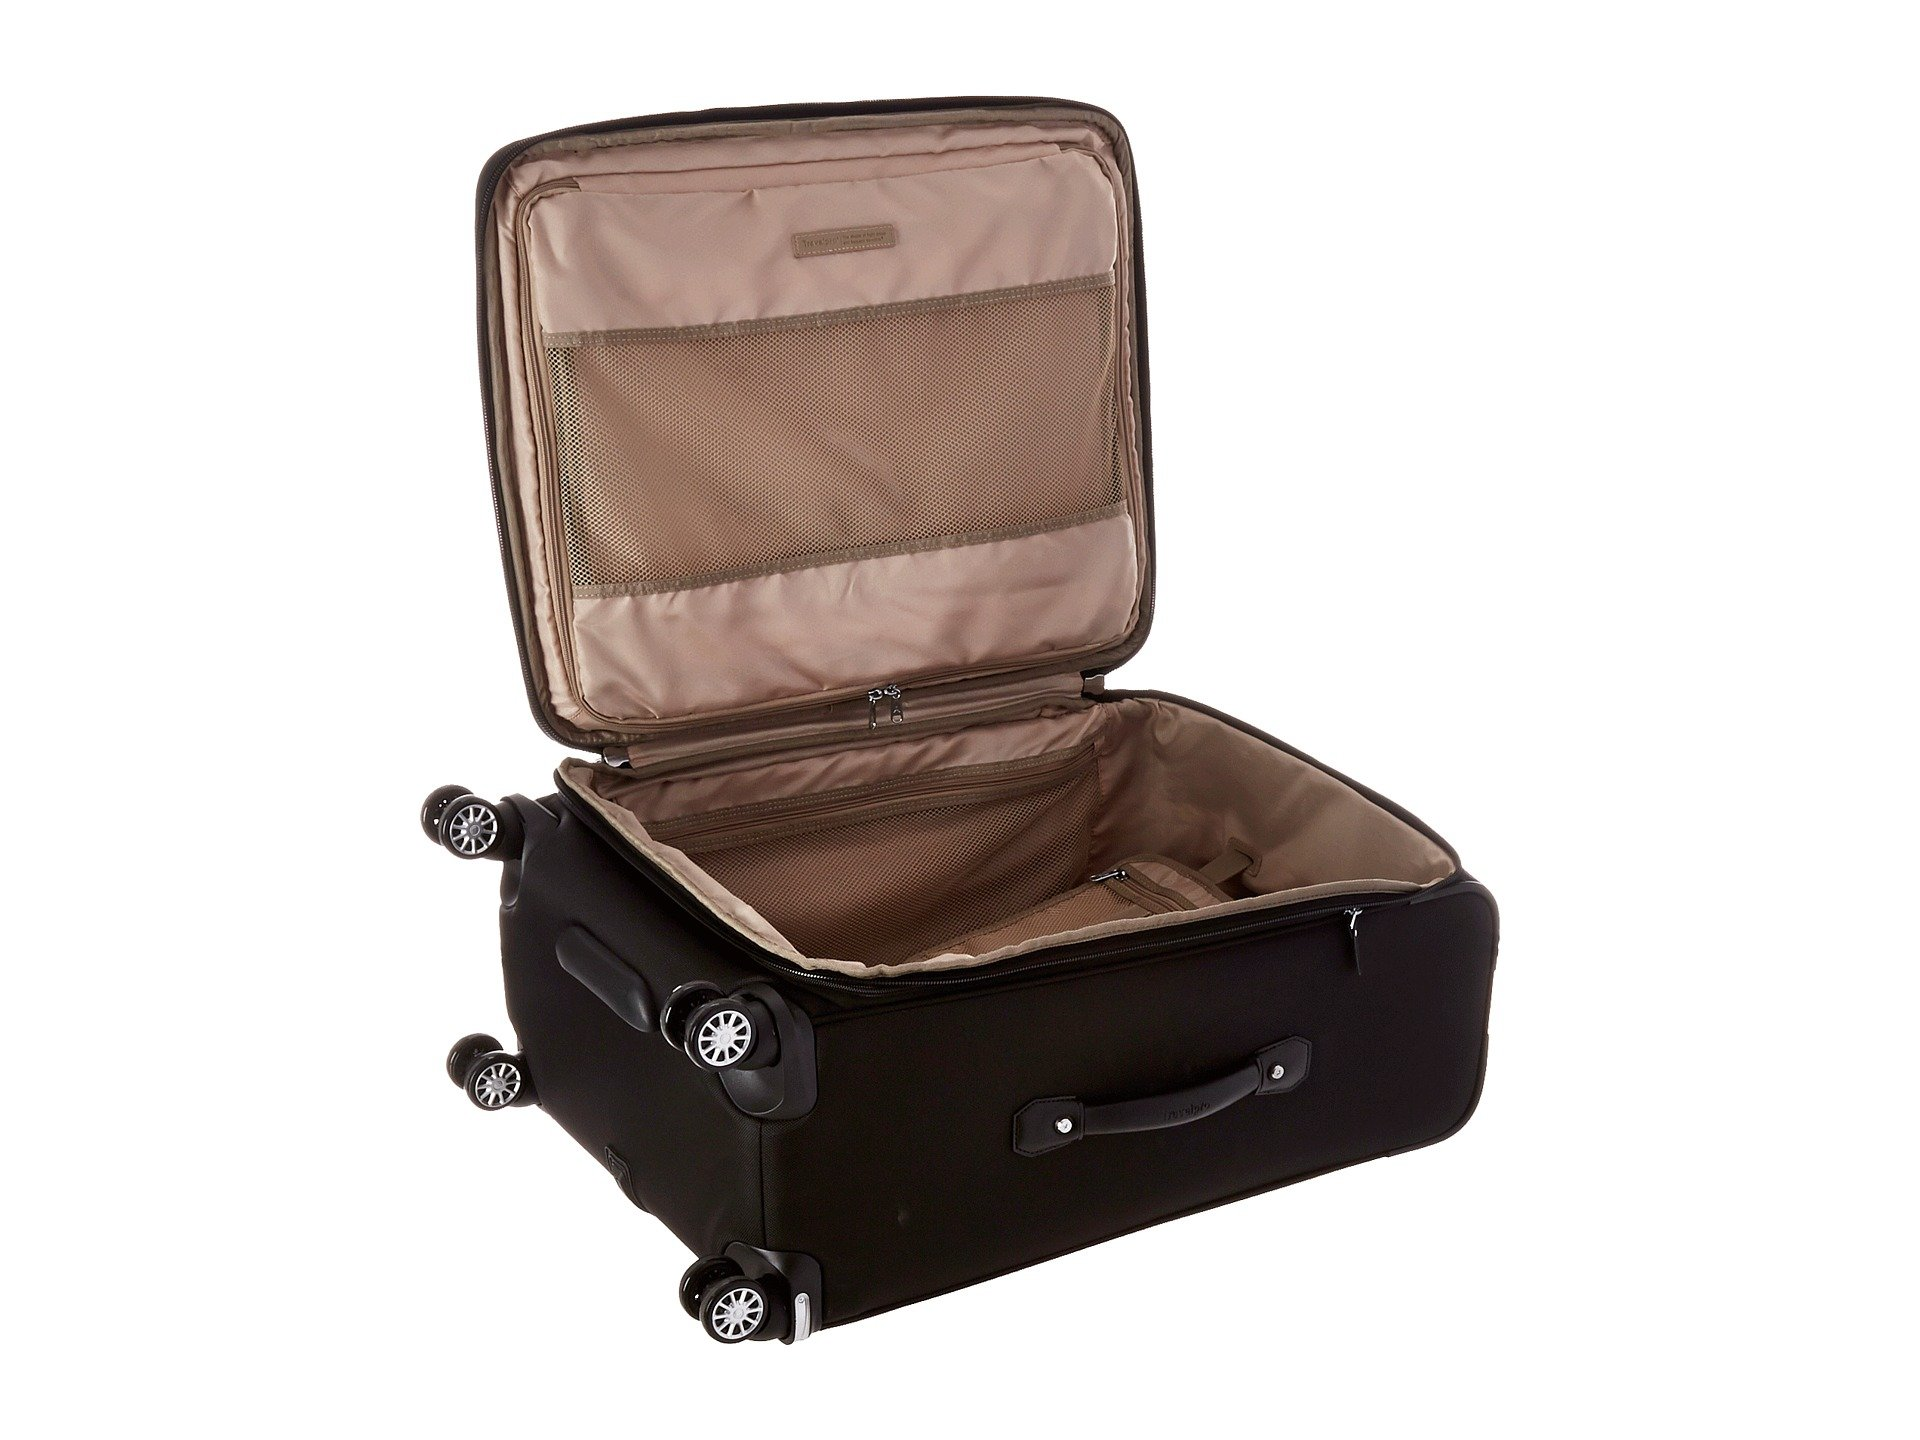 Expandable Suiter Black 2 Magna Travelpro 25